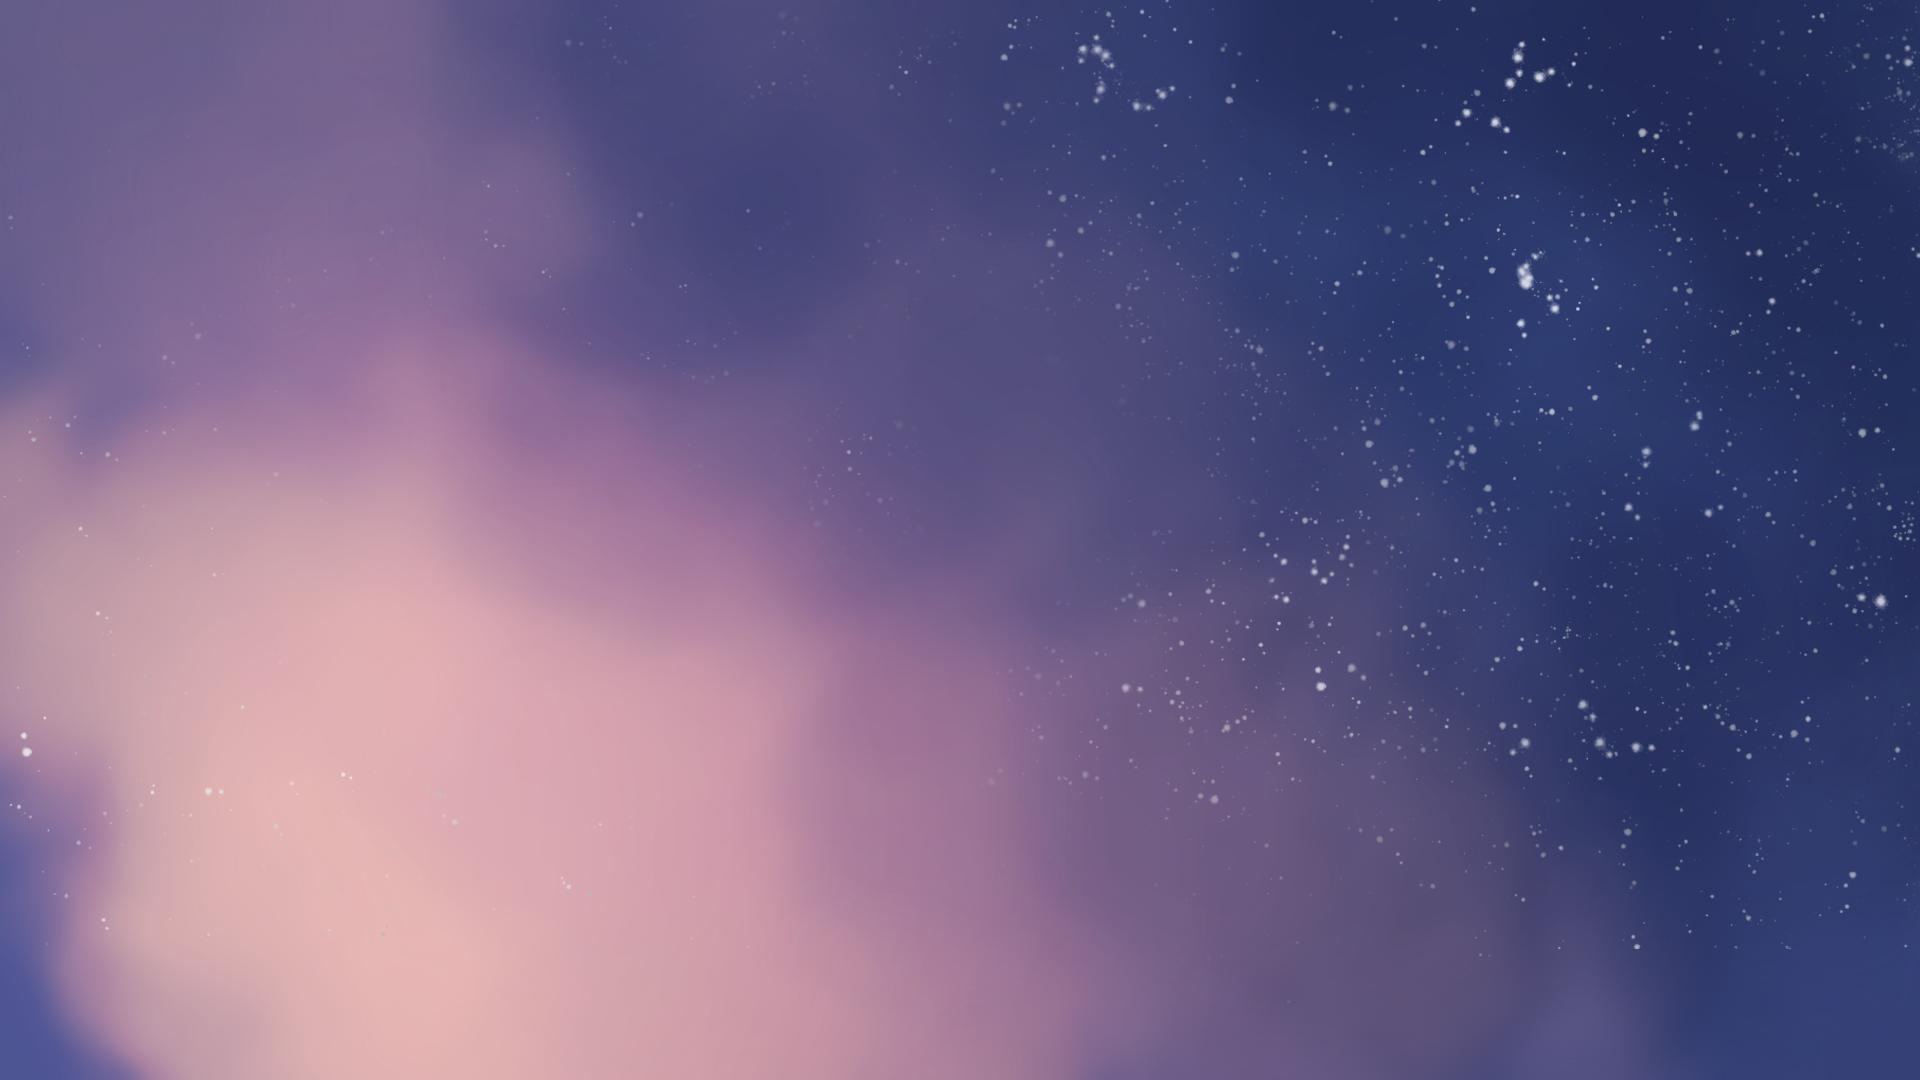 0306_BG_bg sky.png